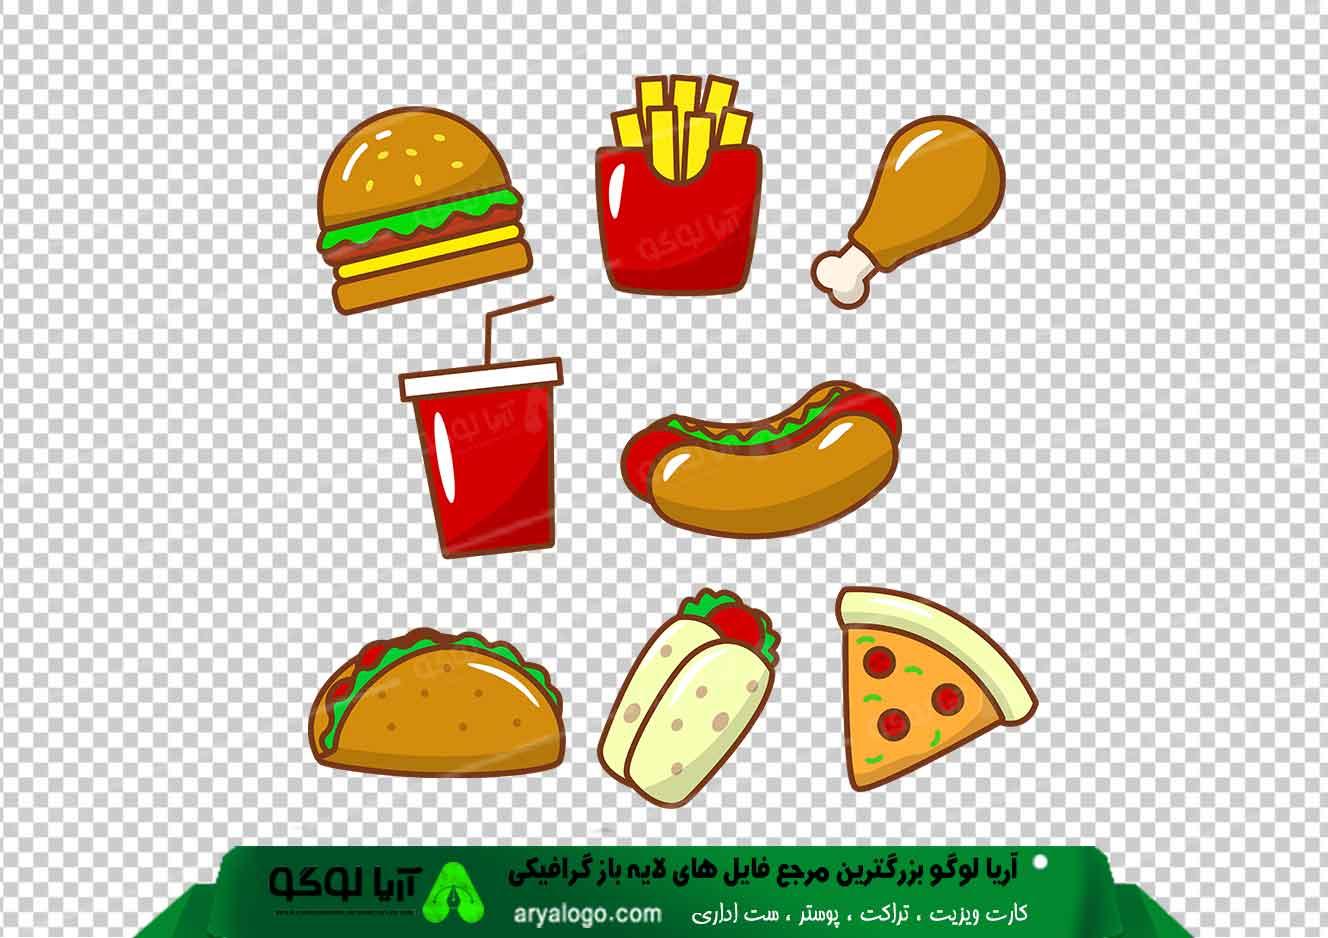 عکس png ساندویچ طرح 10